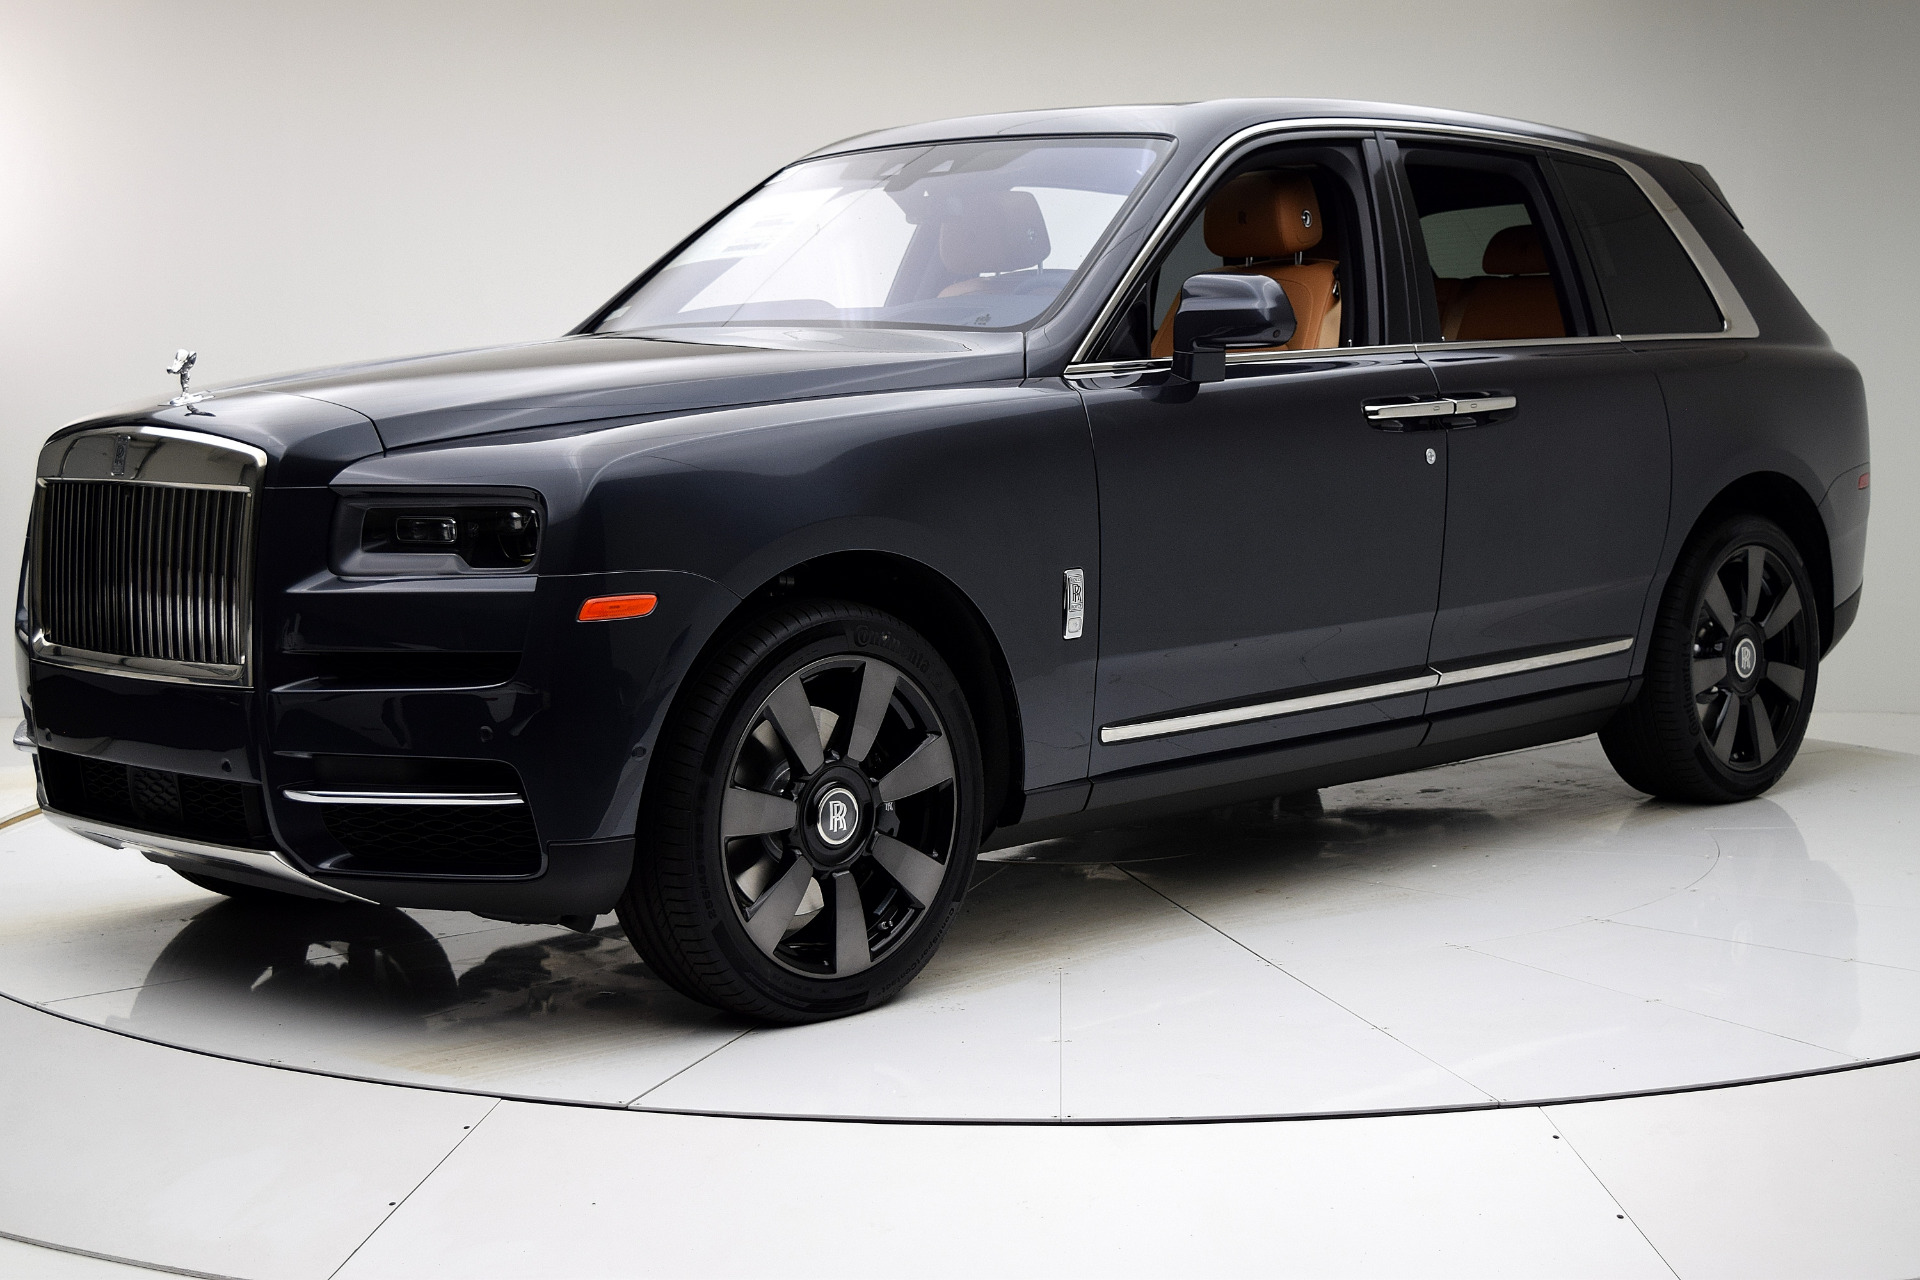 New 2020 Rolls Royce Cullinan For Sale 355 675 F C Kerbeck Rolls Royce Stock 20r104